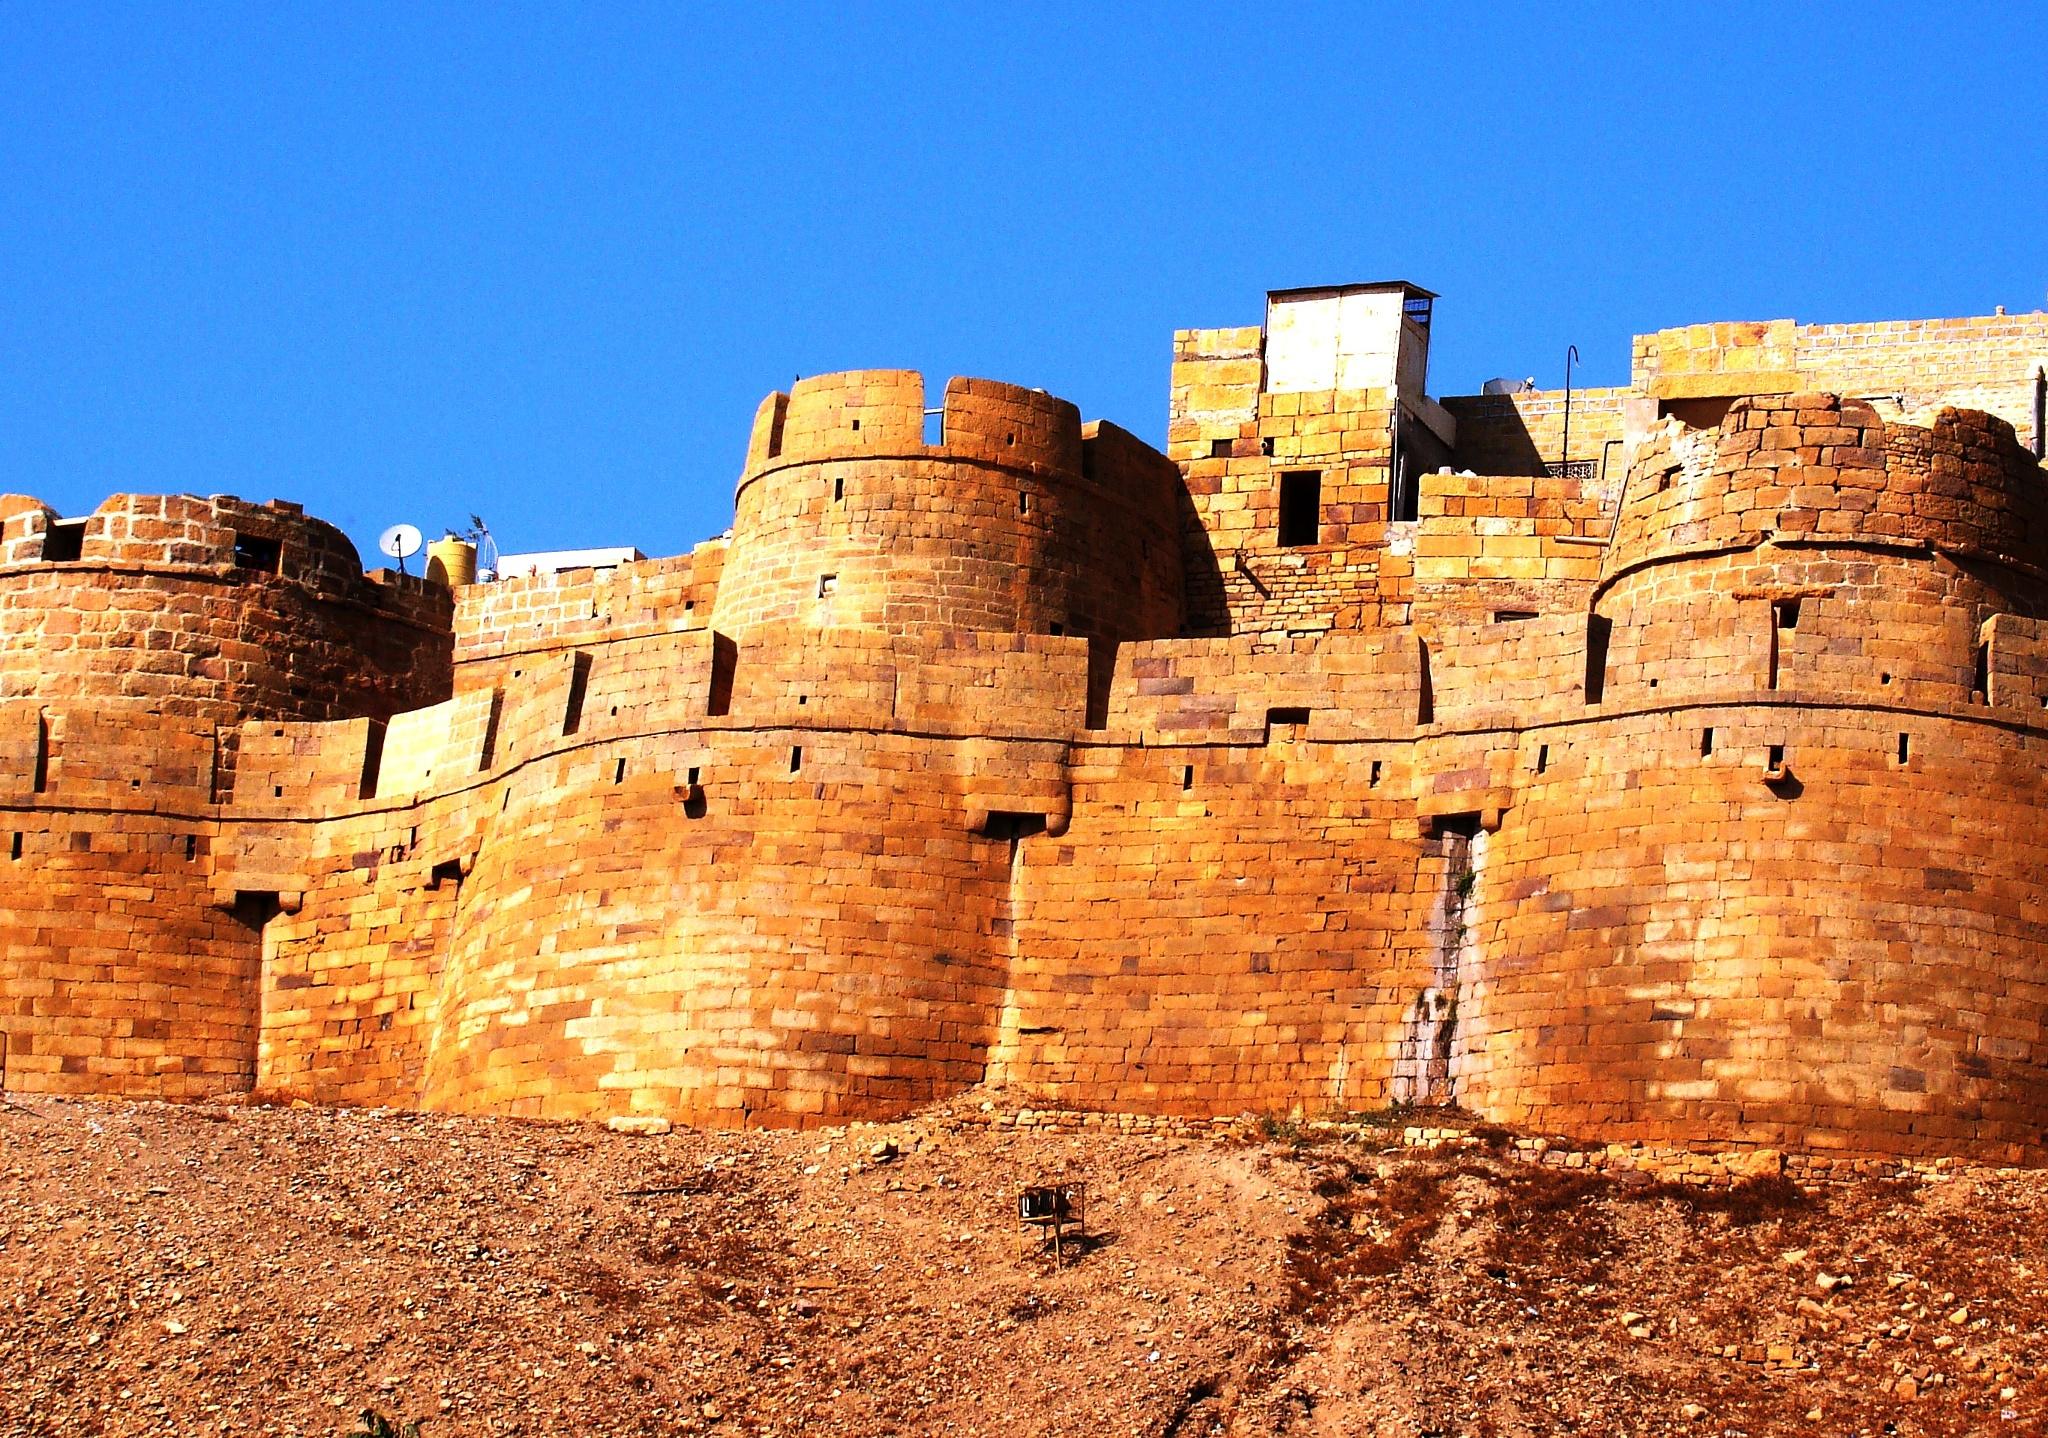 The Golden Fort - Jaisalmir India  by Crazy Dreamz